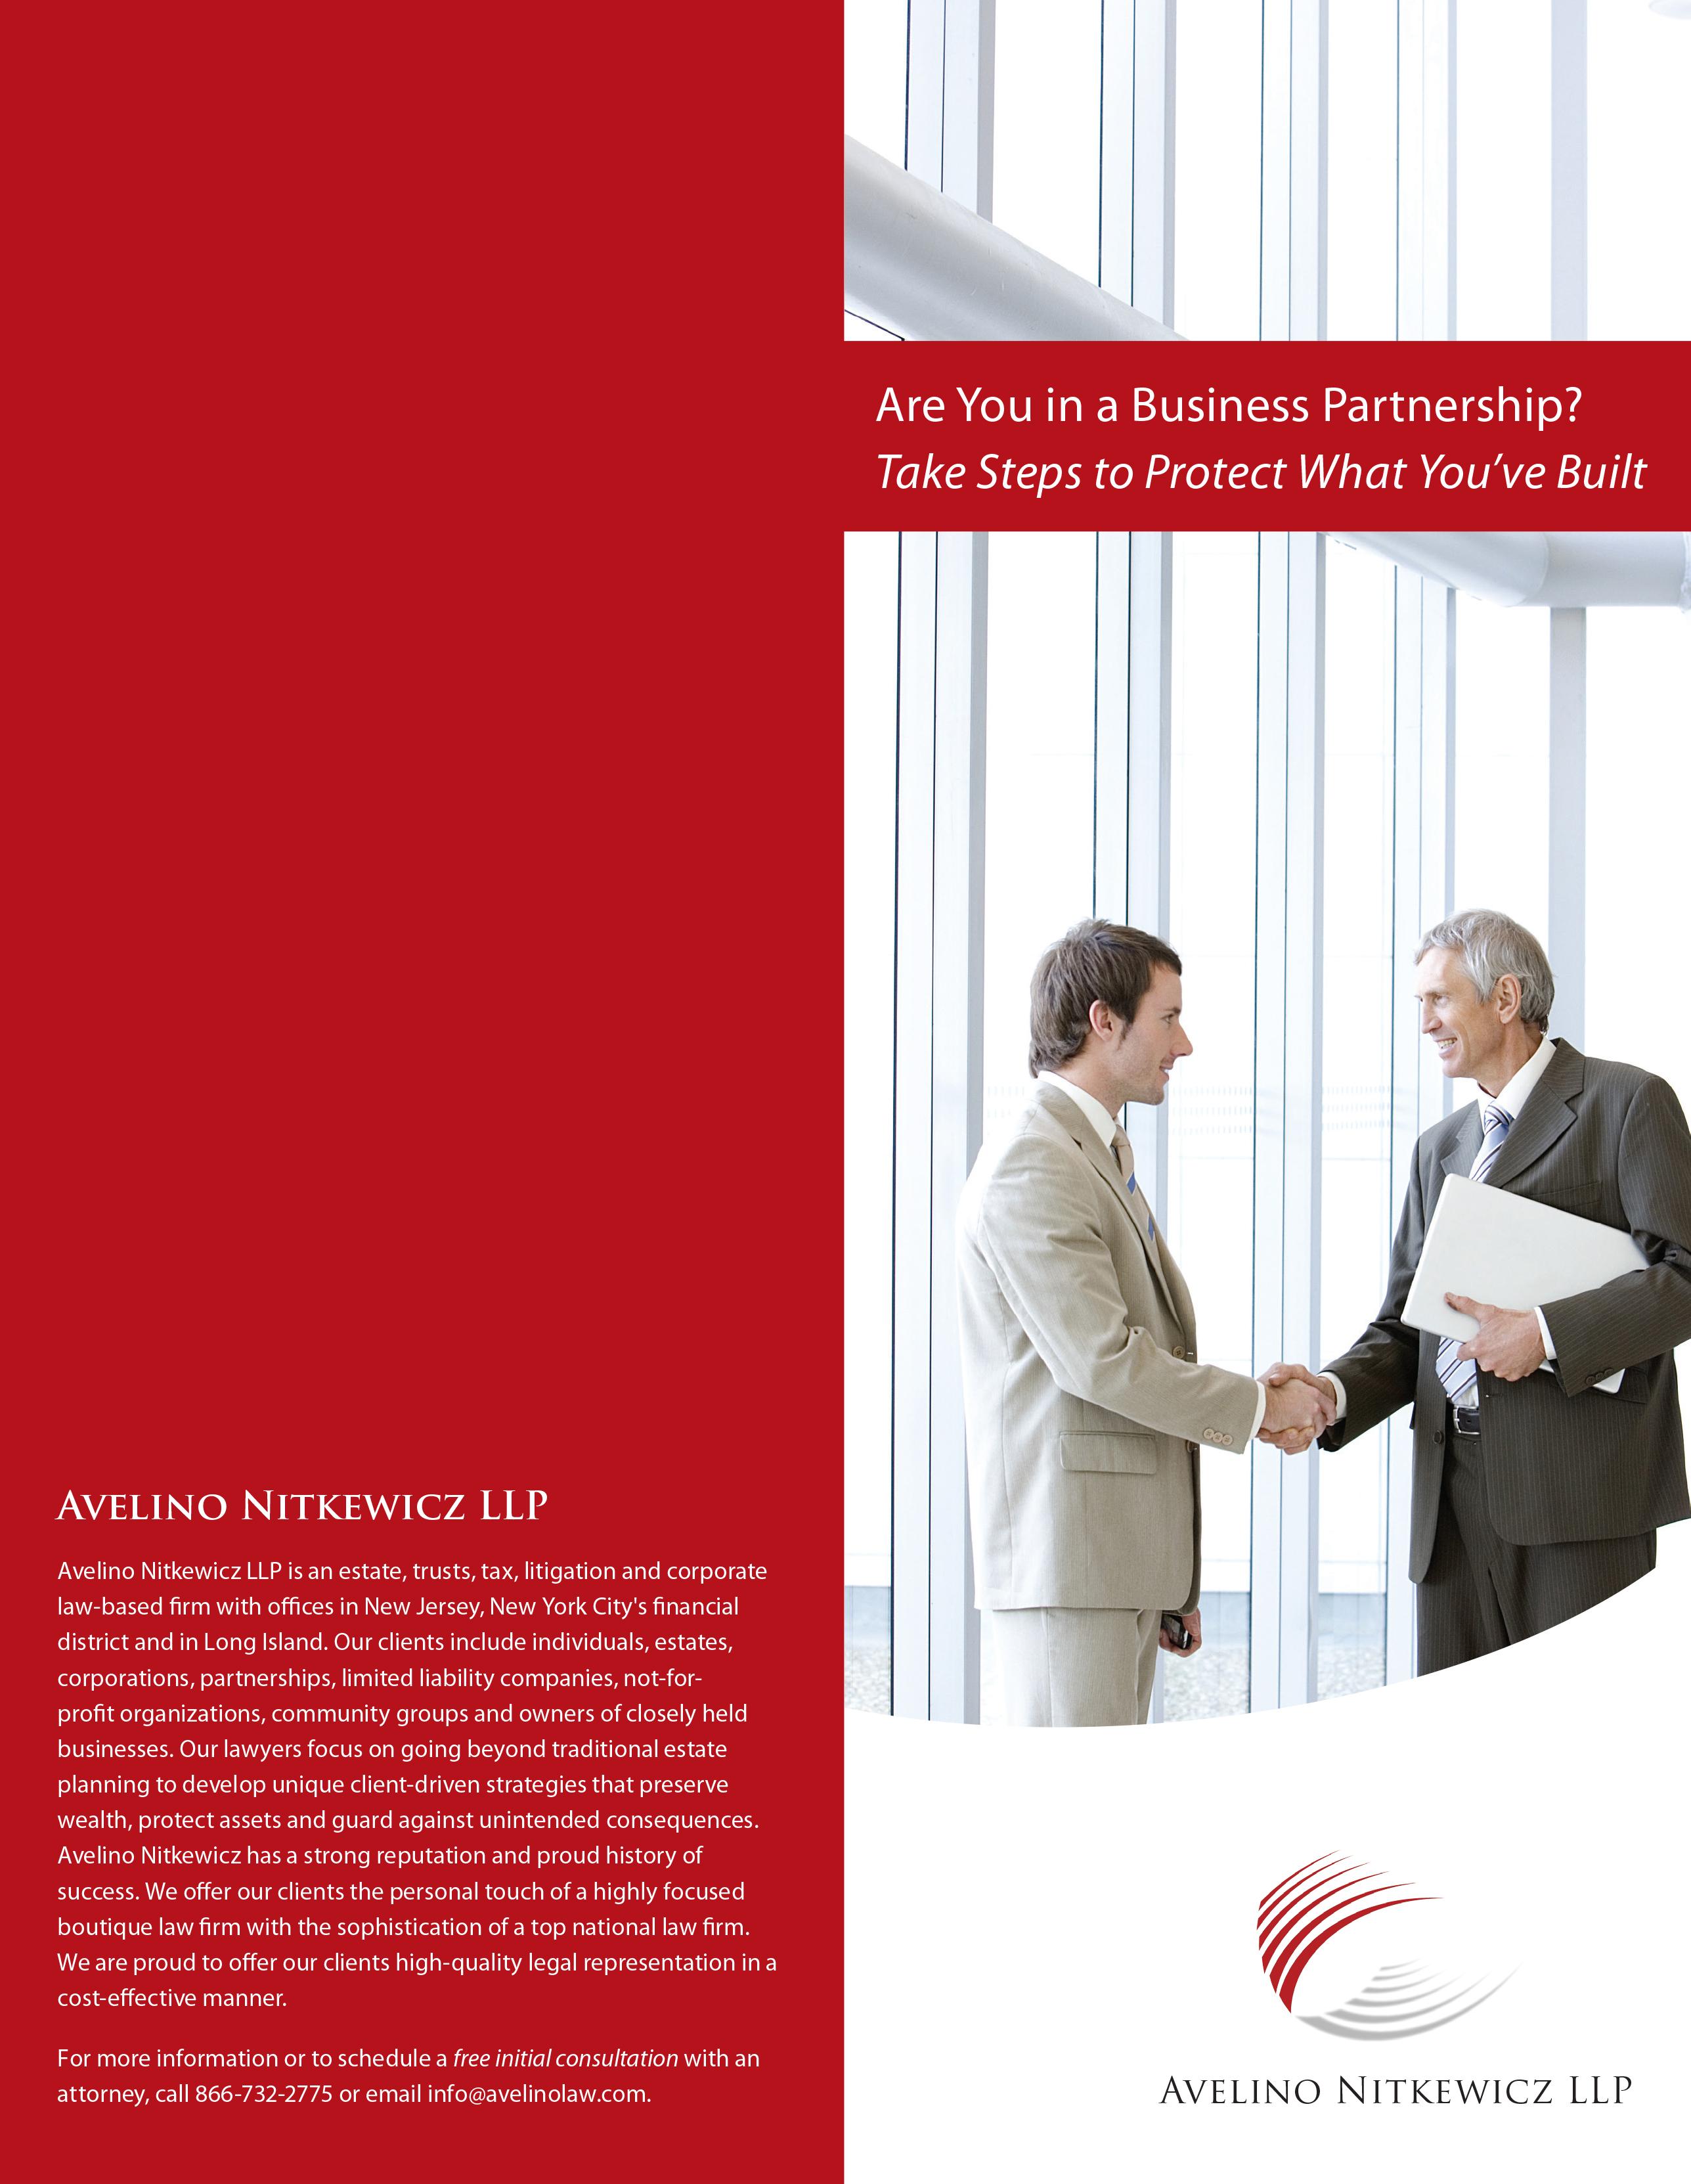 Law Firm Brochures Avelino Nitkewicz LLP – Law Firm Brochure